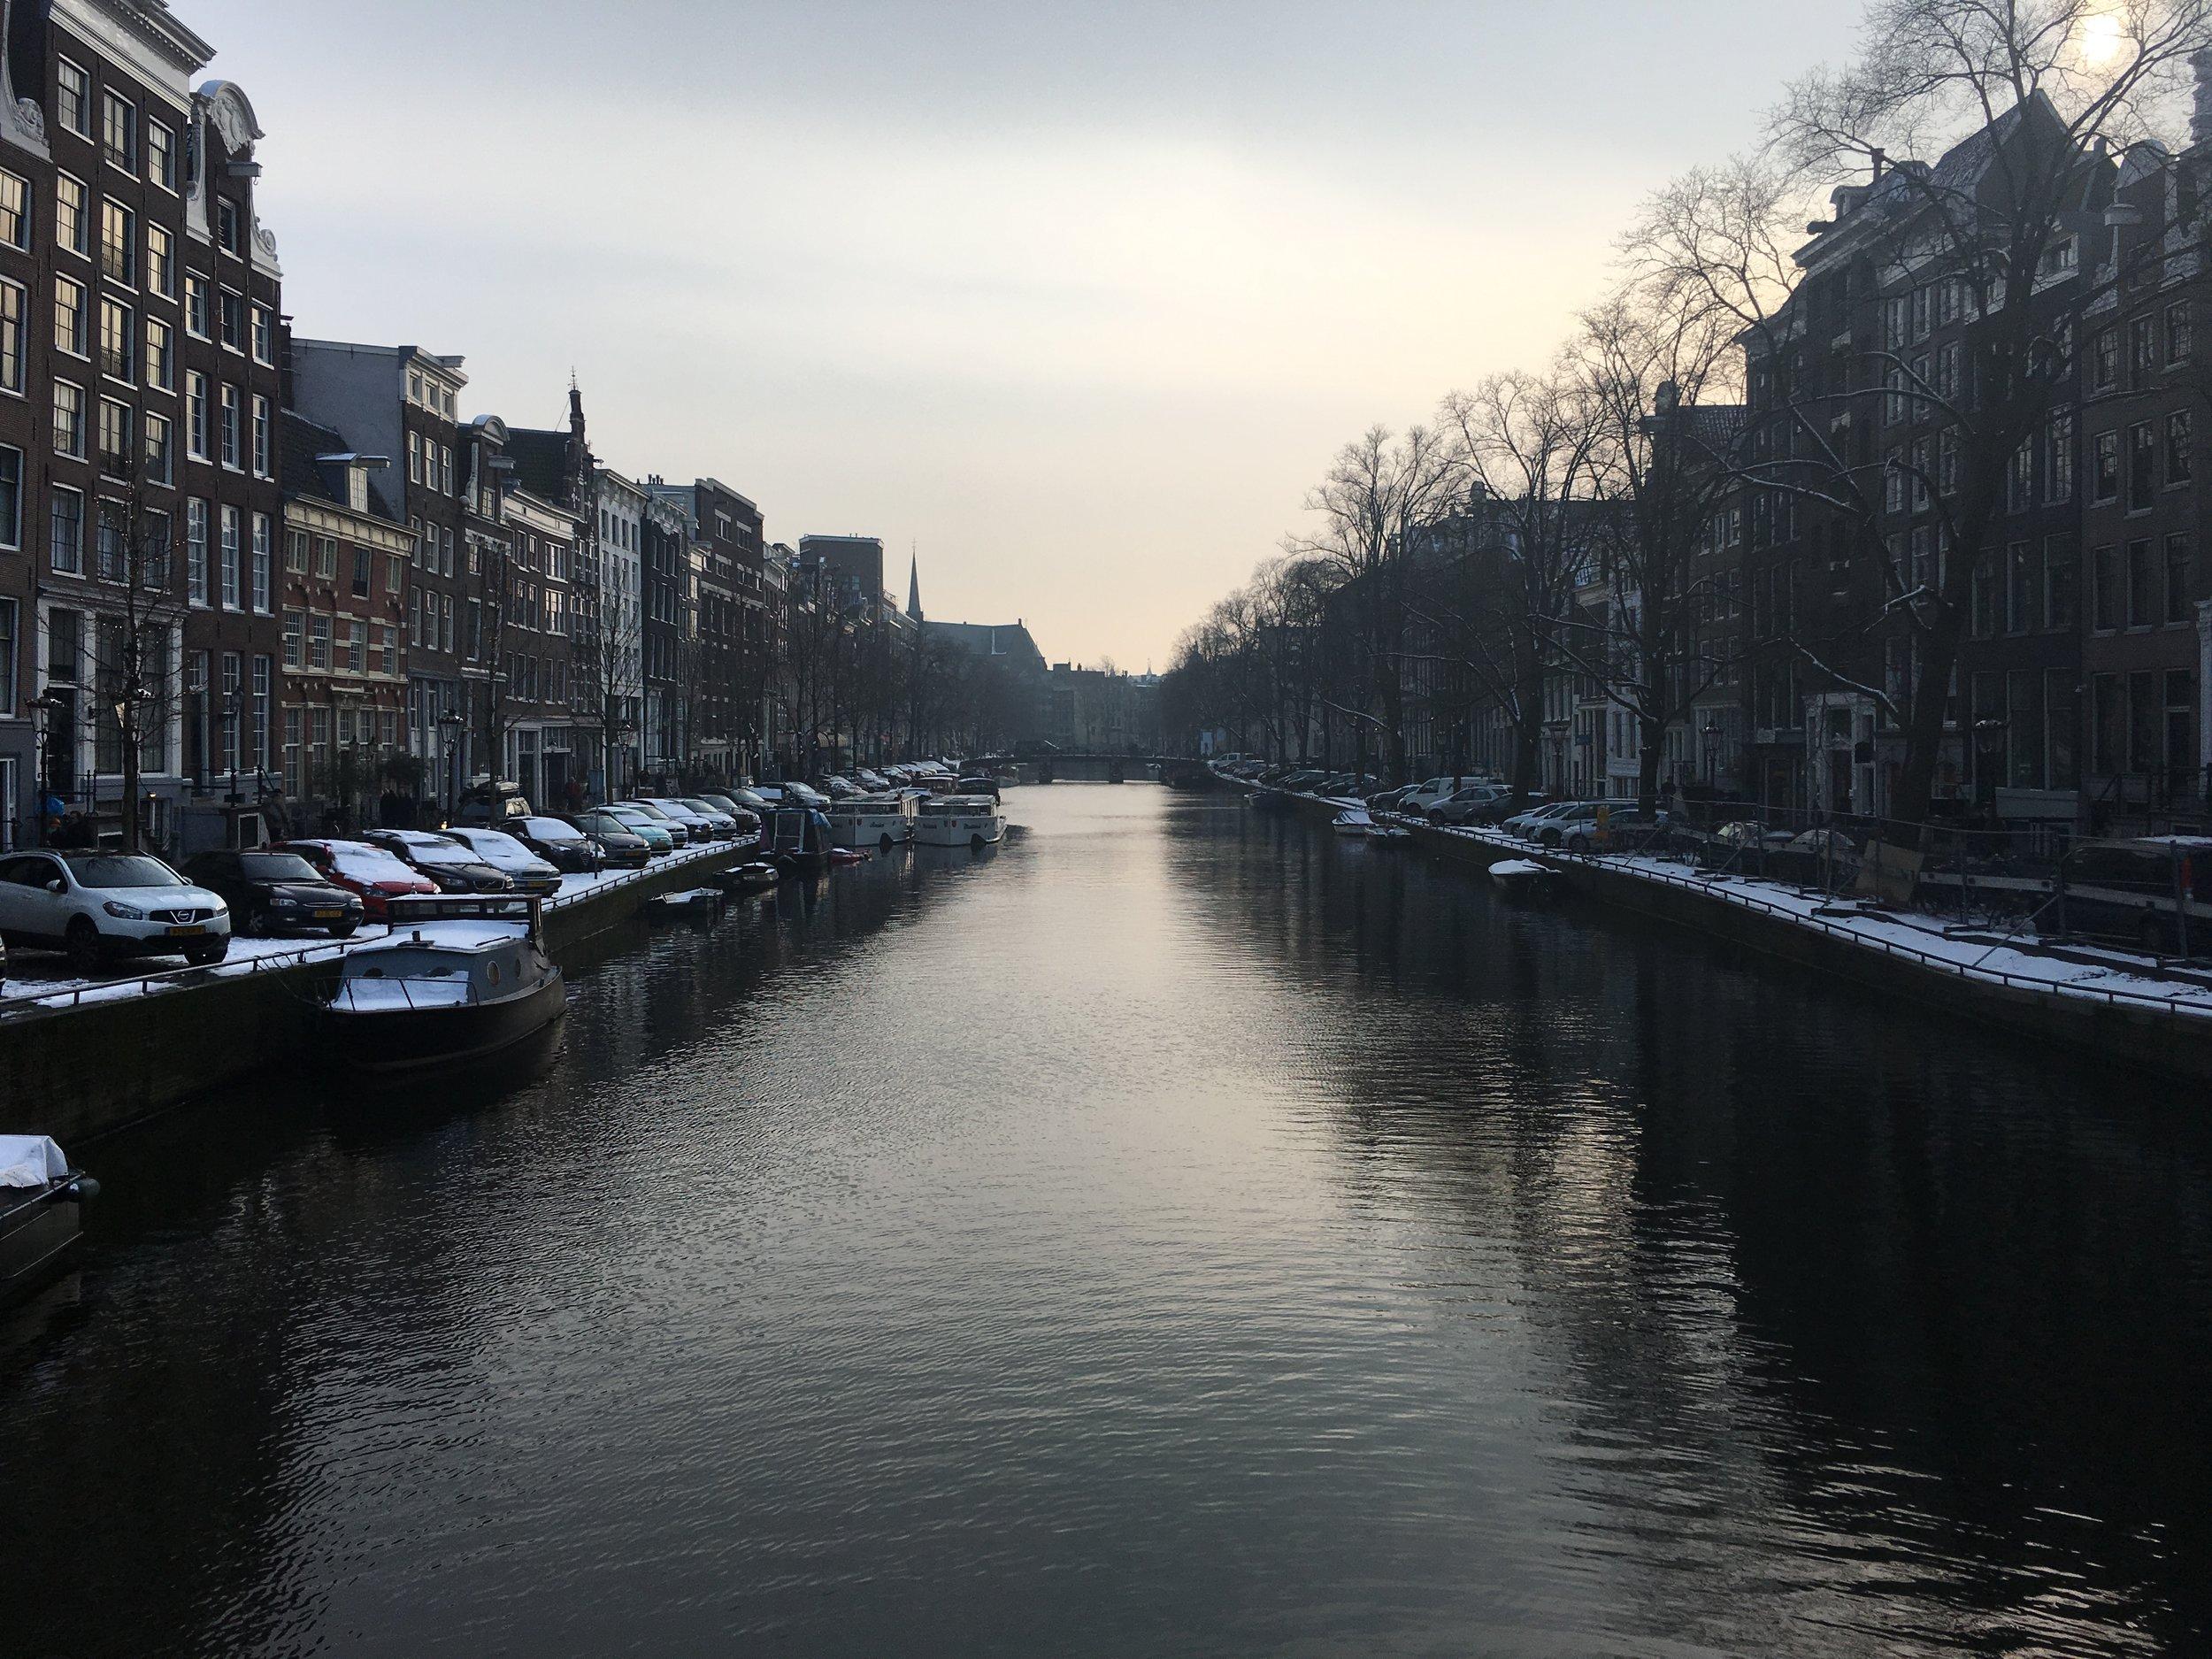 Amsterdam_canal2.JPG